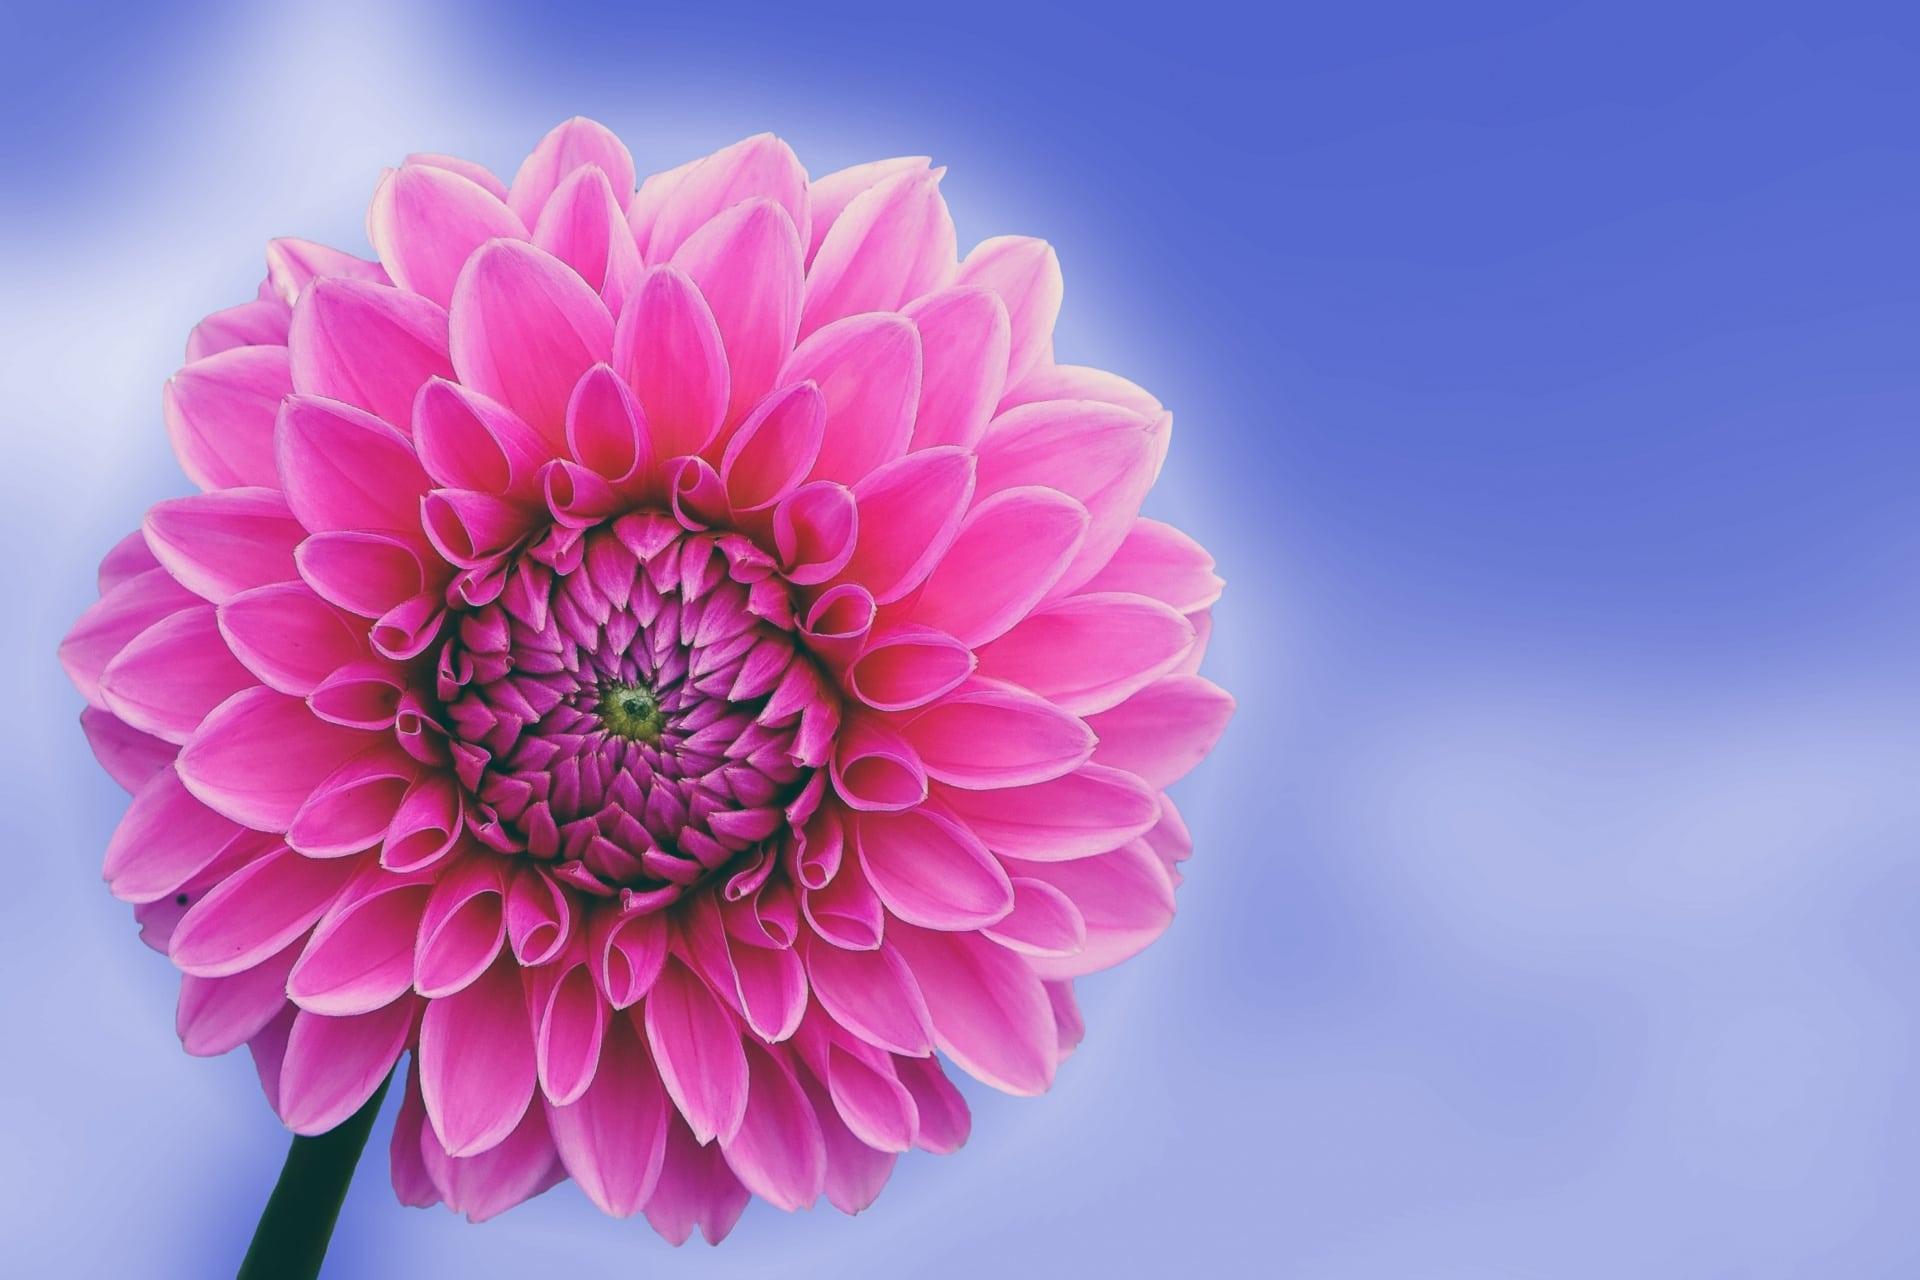 La dalia es una planta ornamental